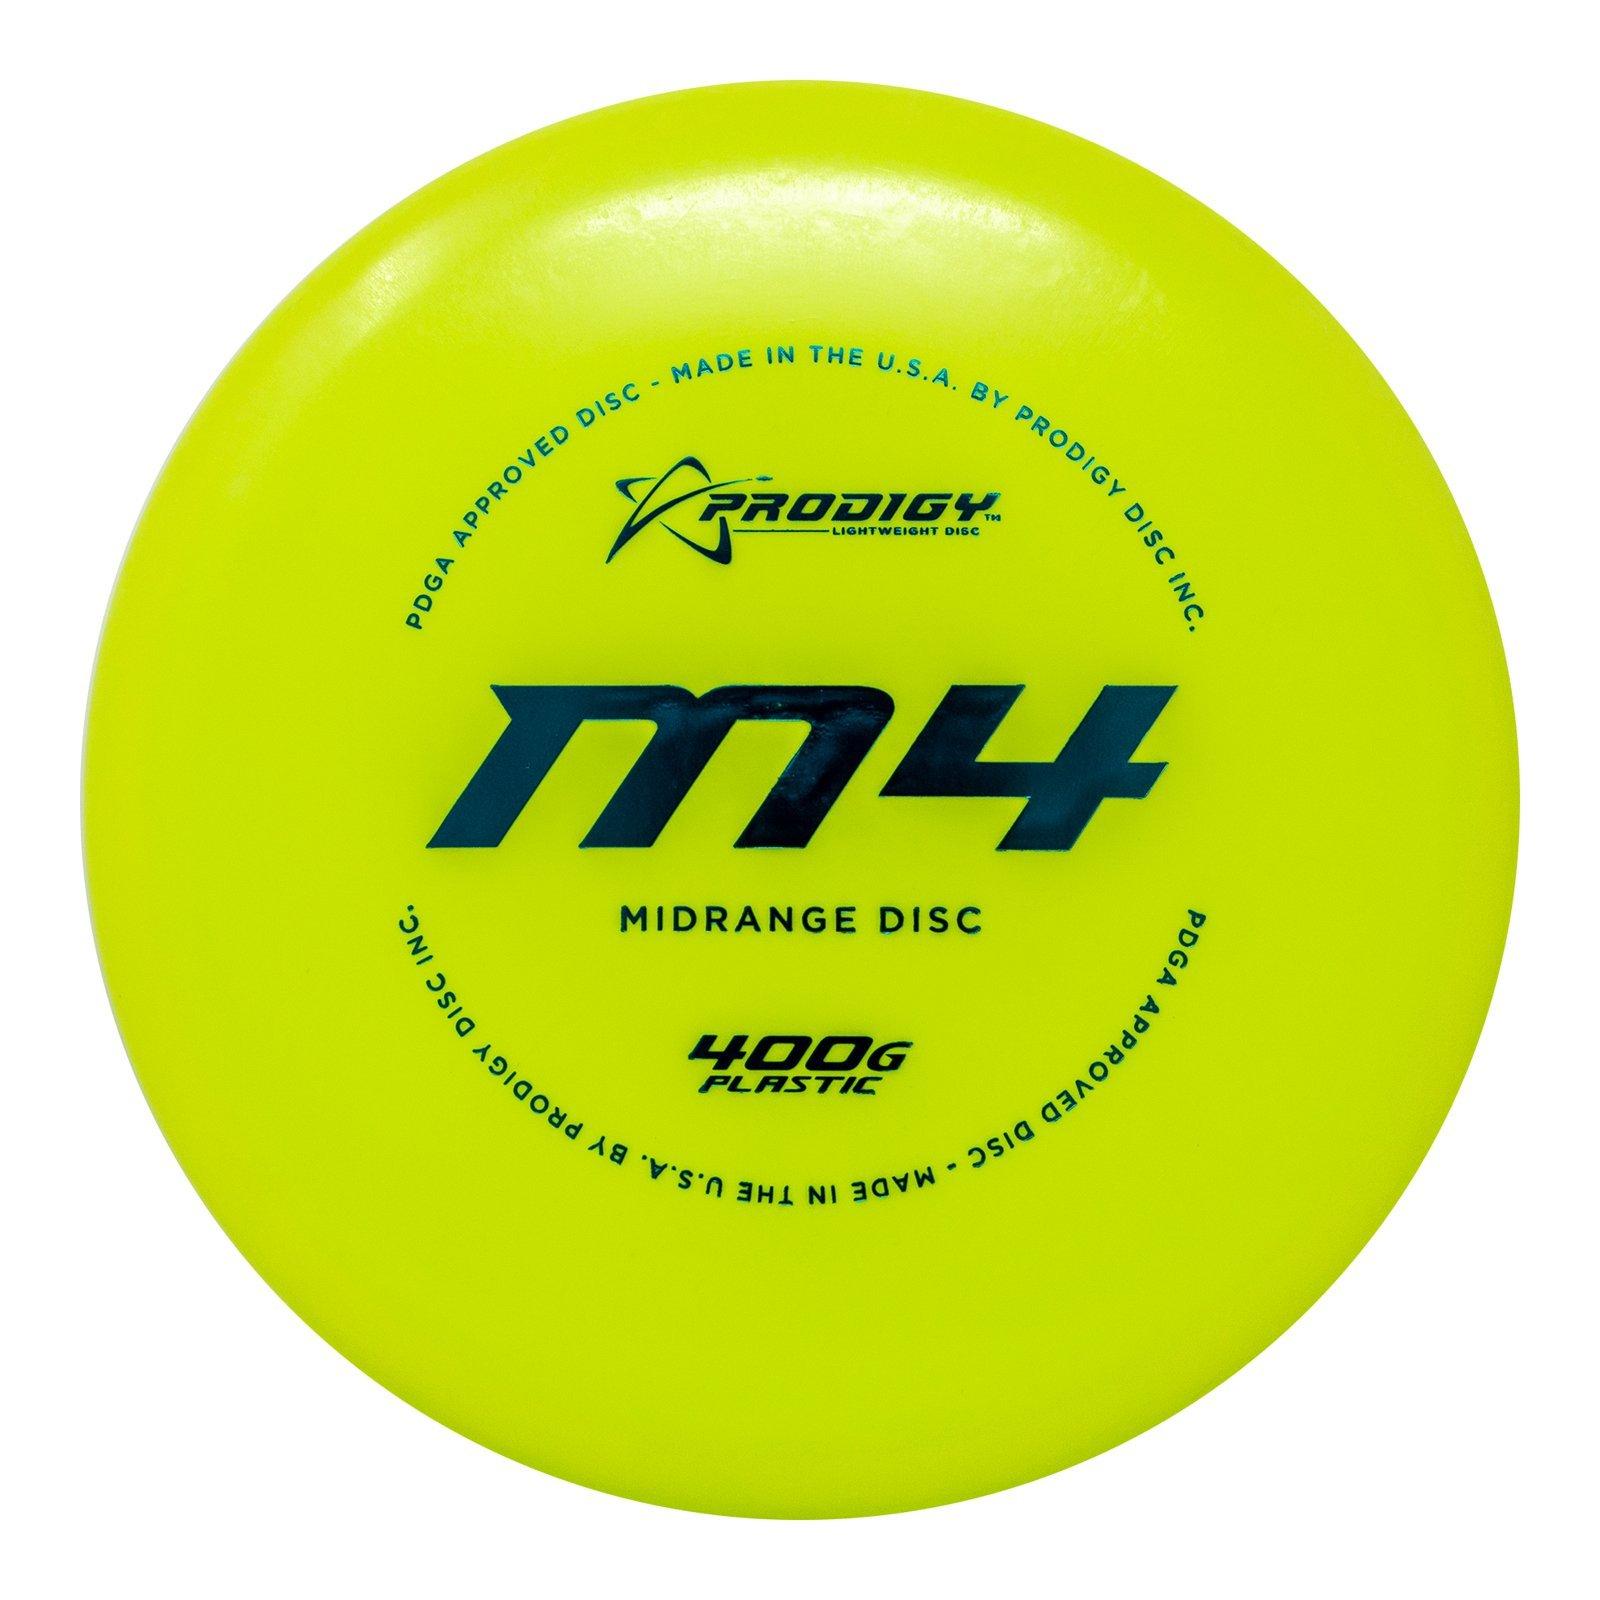 Prodigy m4 midrange disc